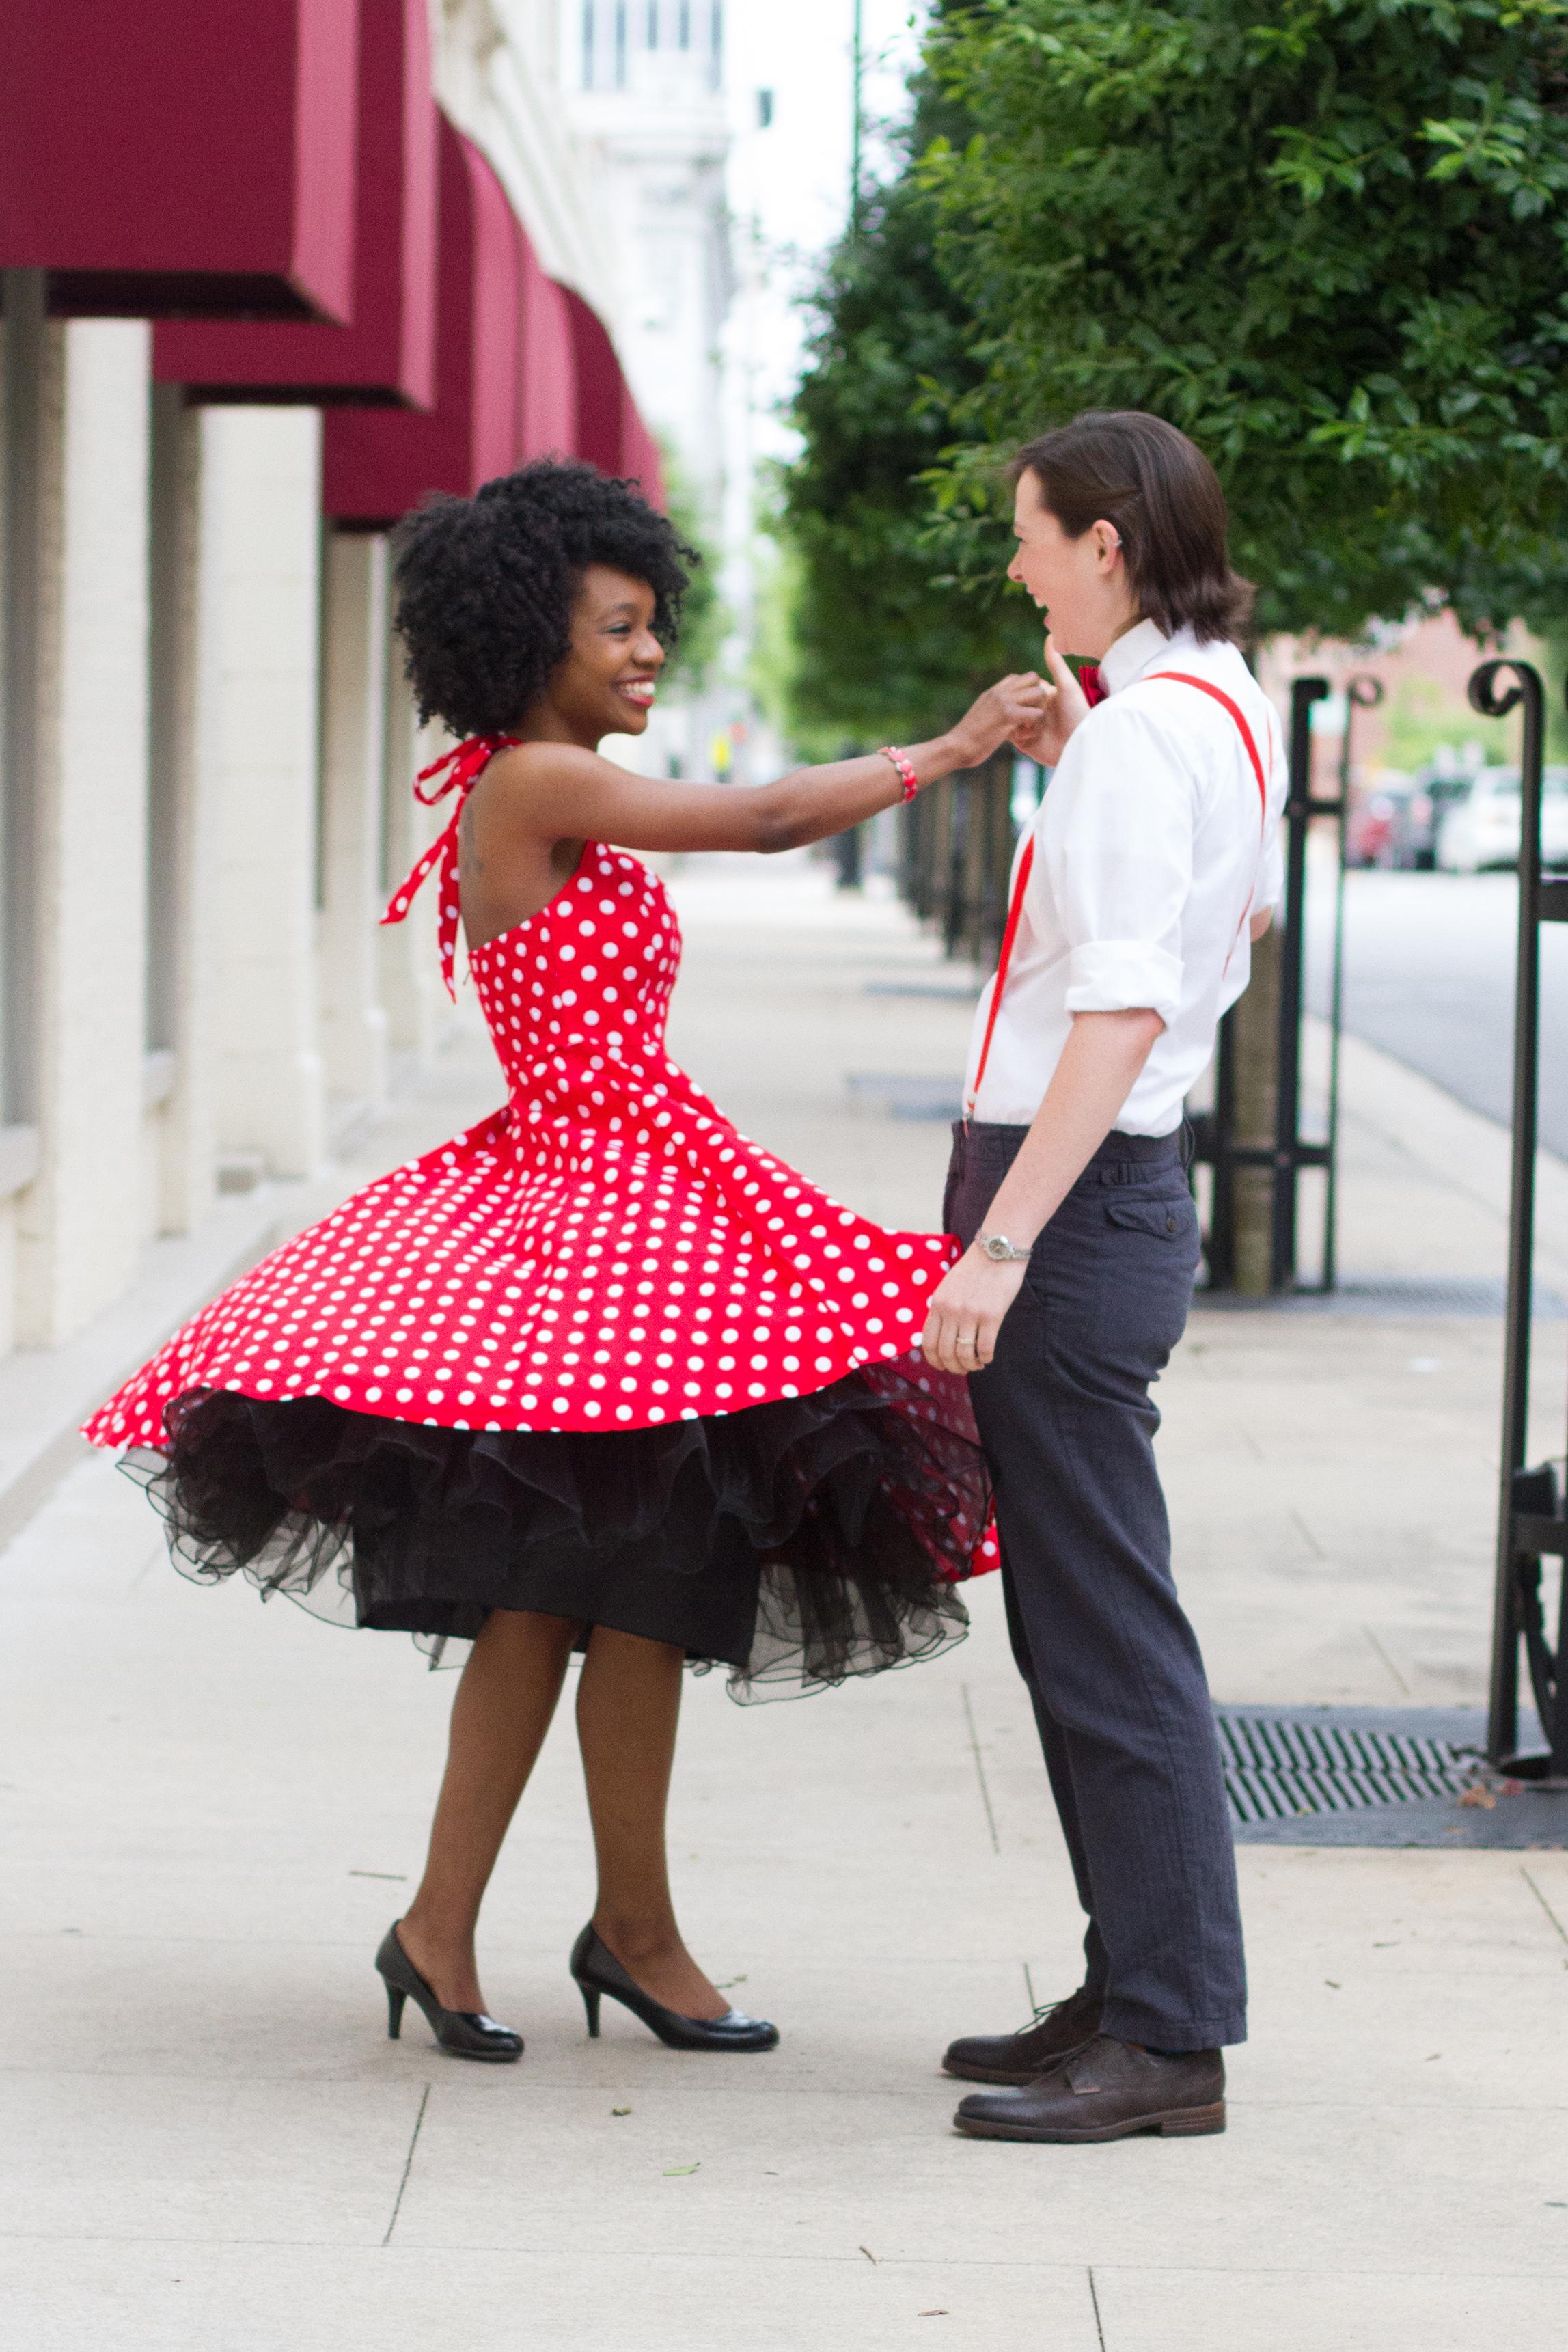 lesbian couple LGBTQ girl spinning dancing girlfriend